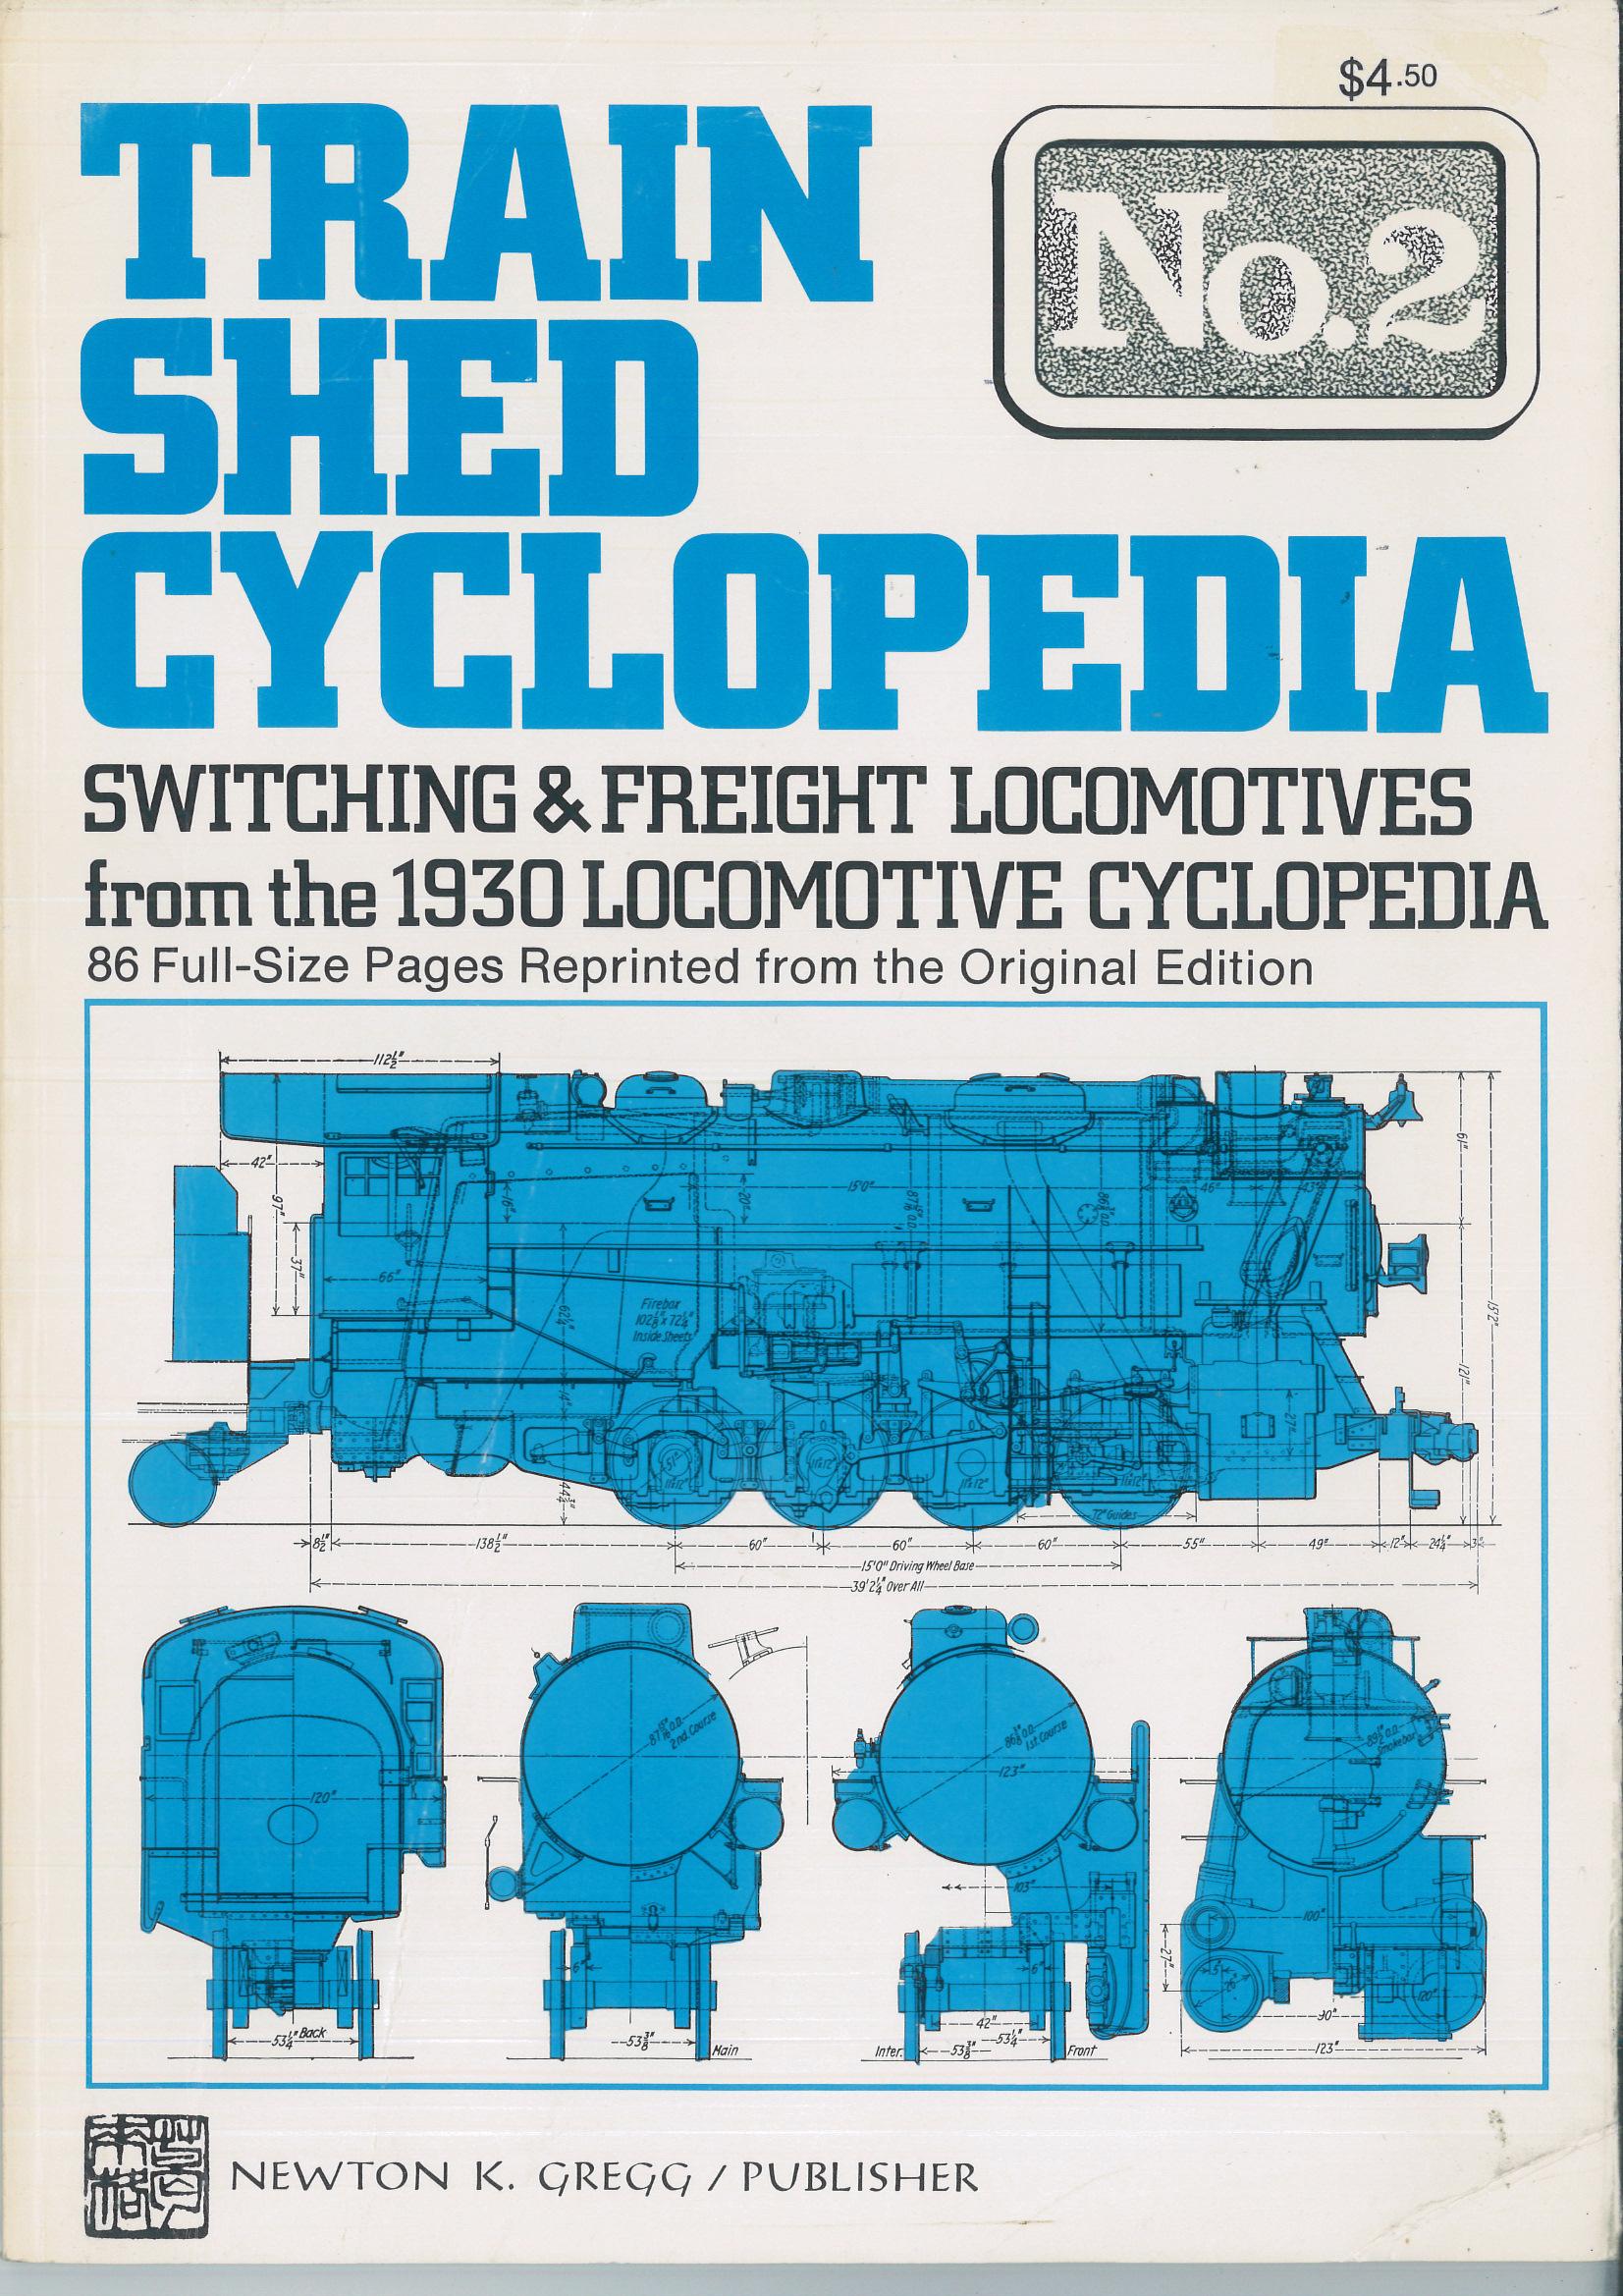 Train Shed Cyclopedia No. 2: Switching & Freight Locomotives from the 1930 Locomotive Cyclopedia  | günstig bestellen bei Modelleisenbahn Center  MCS Vertriebs GmbH